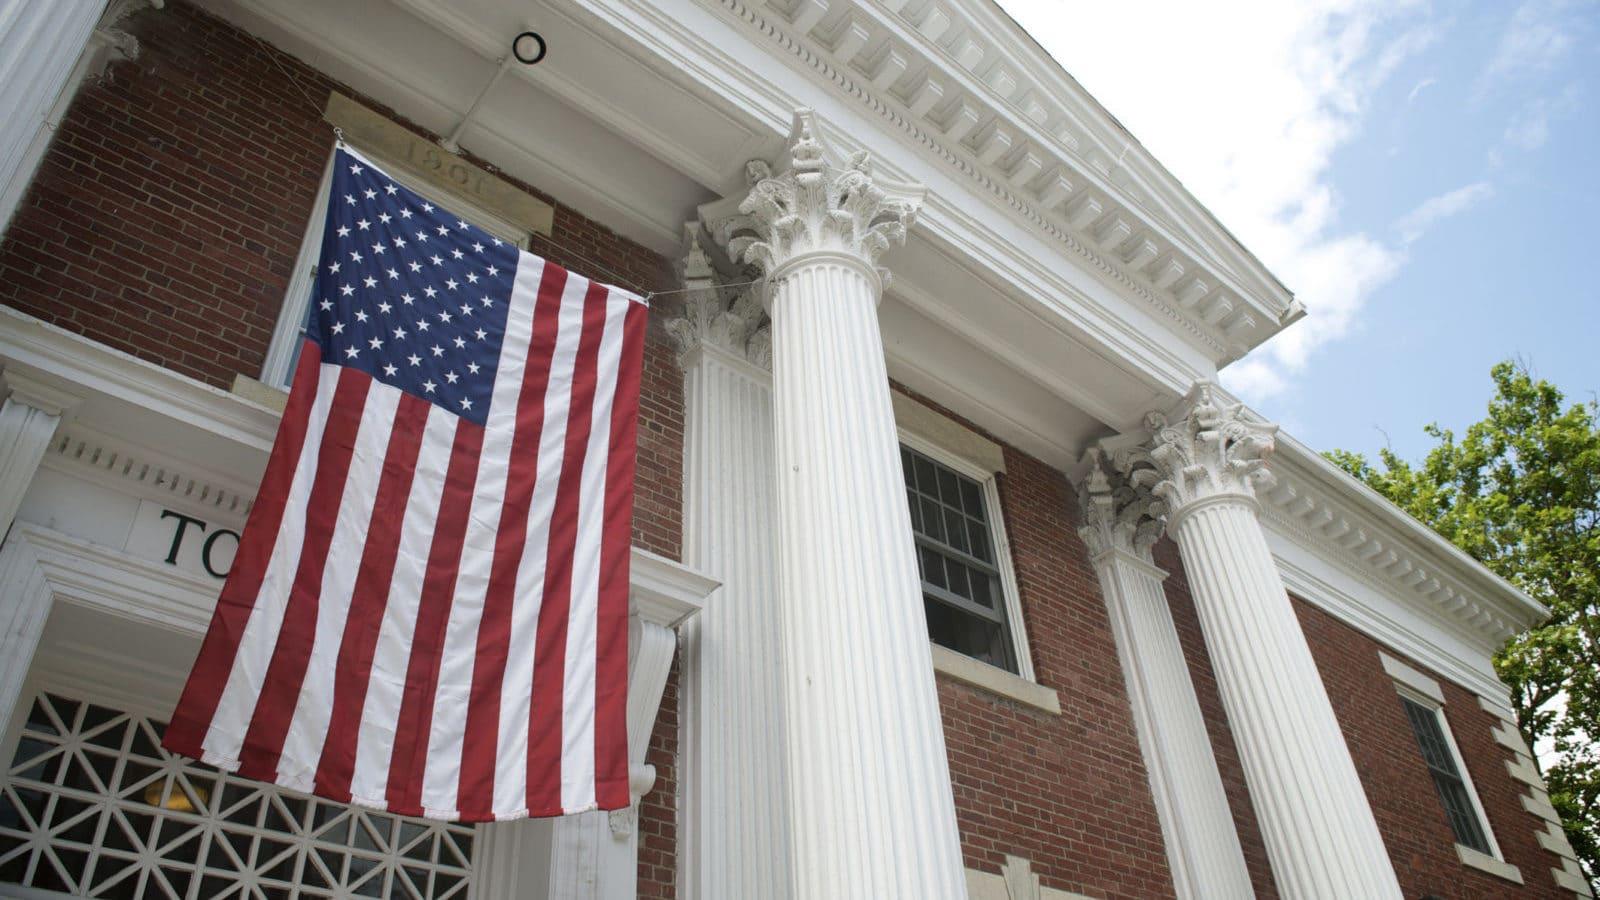 American flag hangs between the white columns